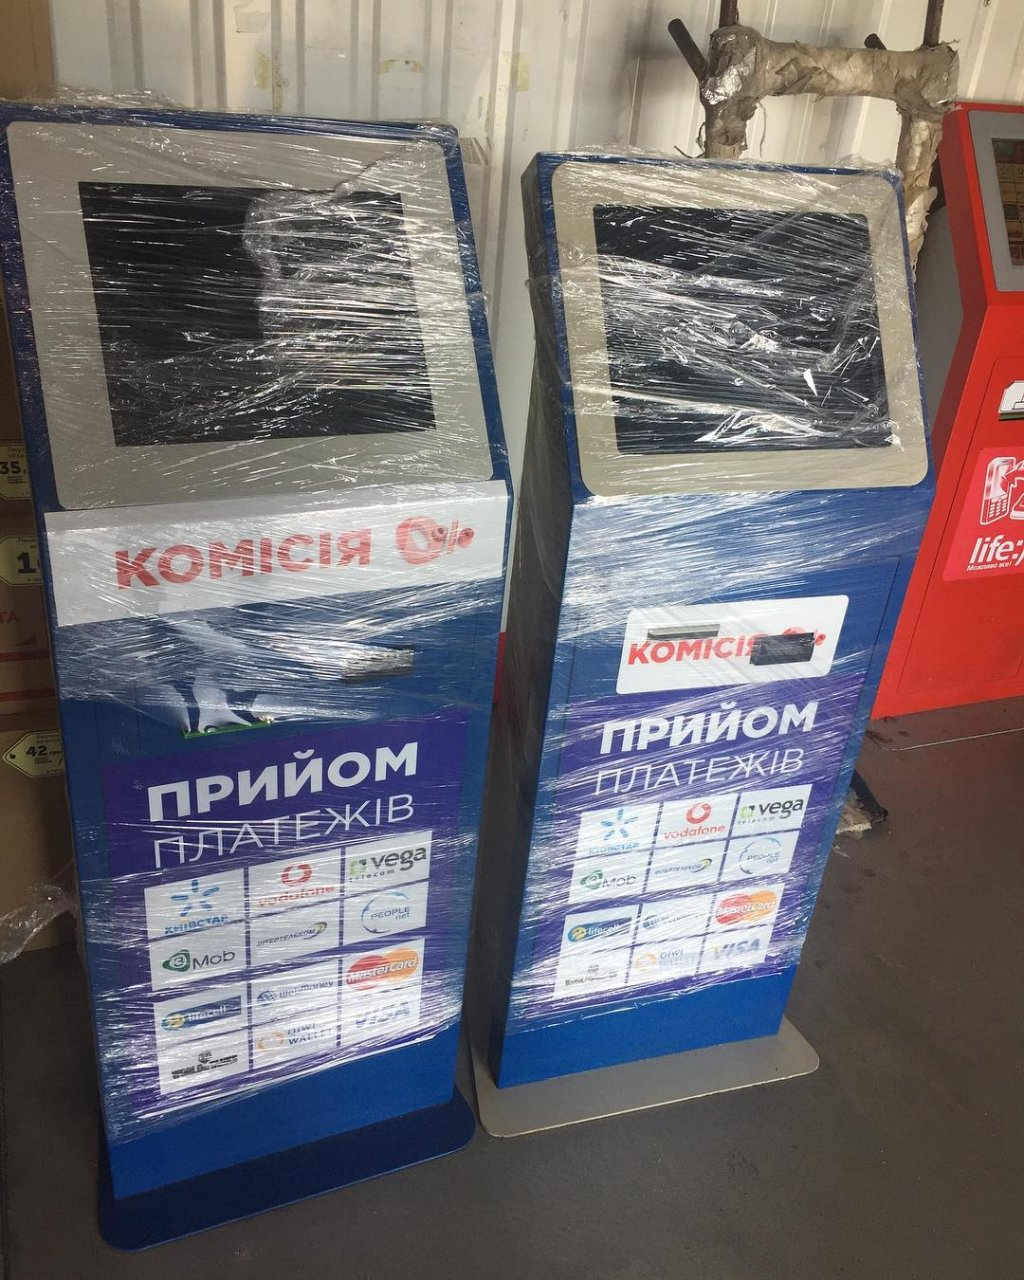 Moneybox - мои Отзывы о платежном терминале Moneybox.net.ua